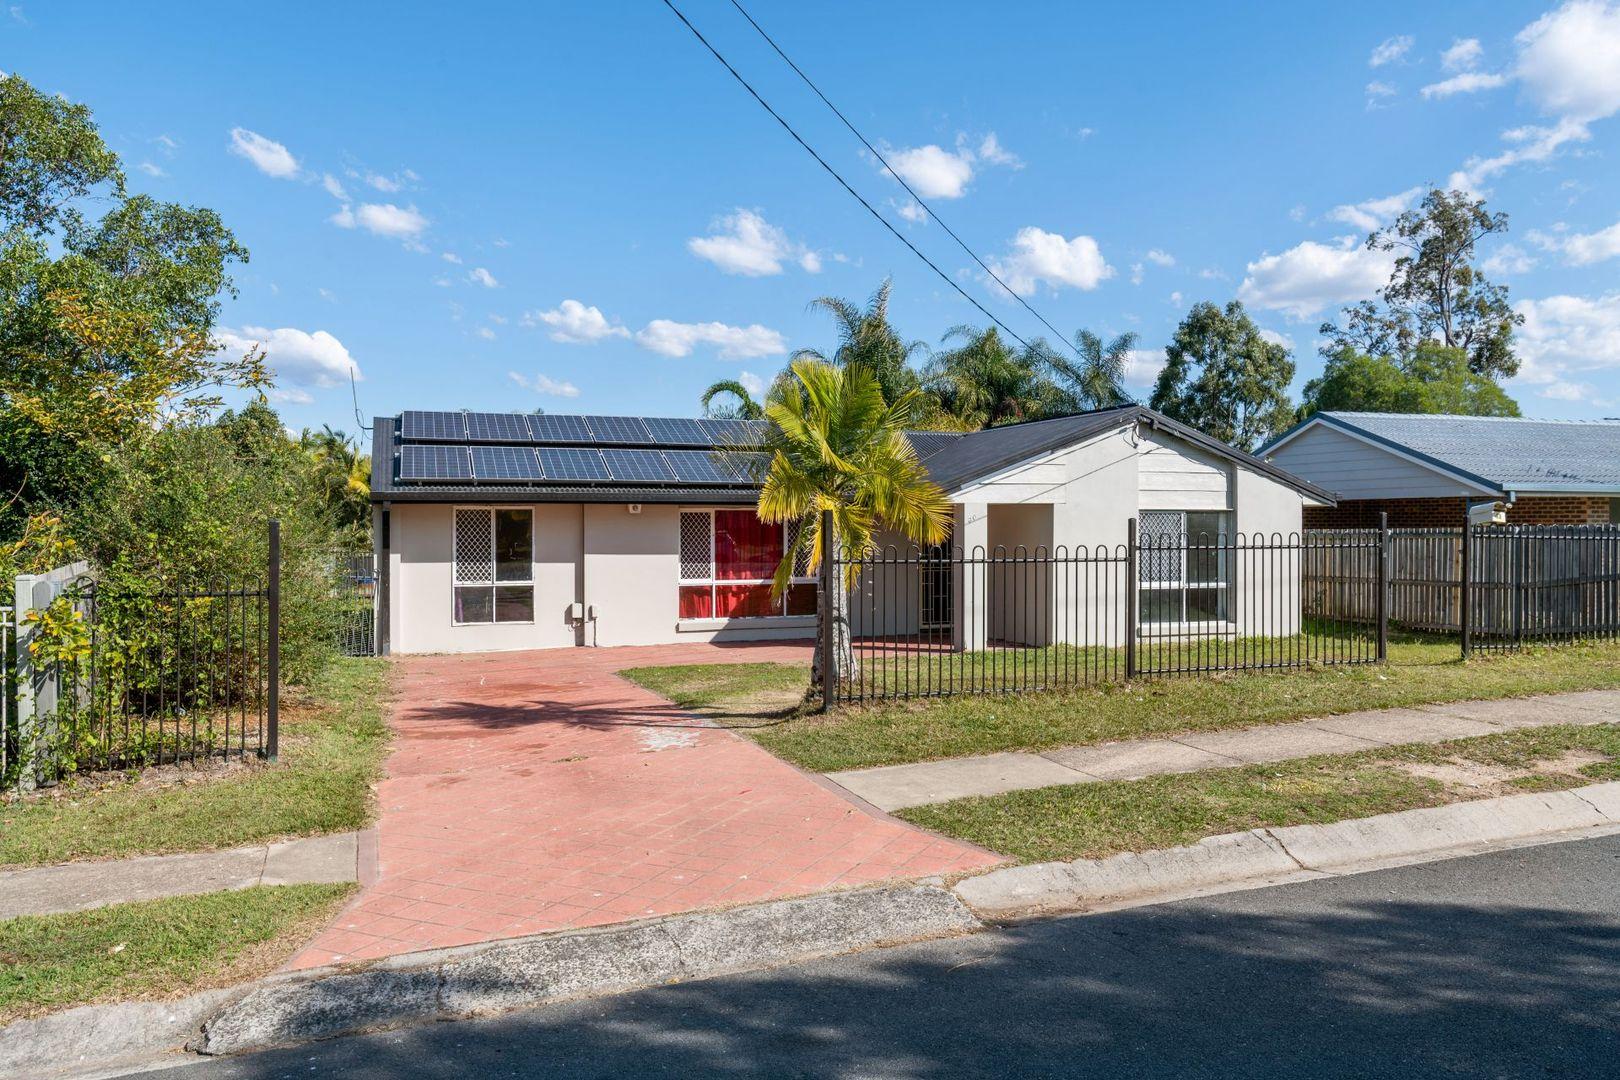 30 Whiteman Street, Crestmead QLD 4132, Image 0